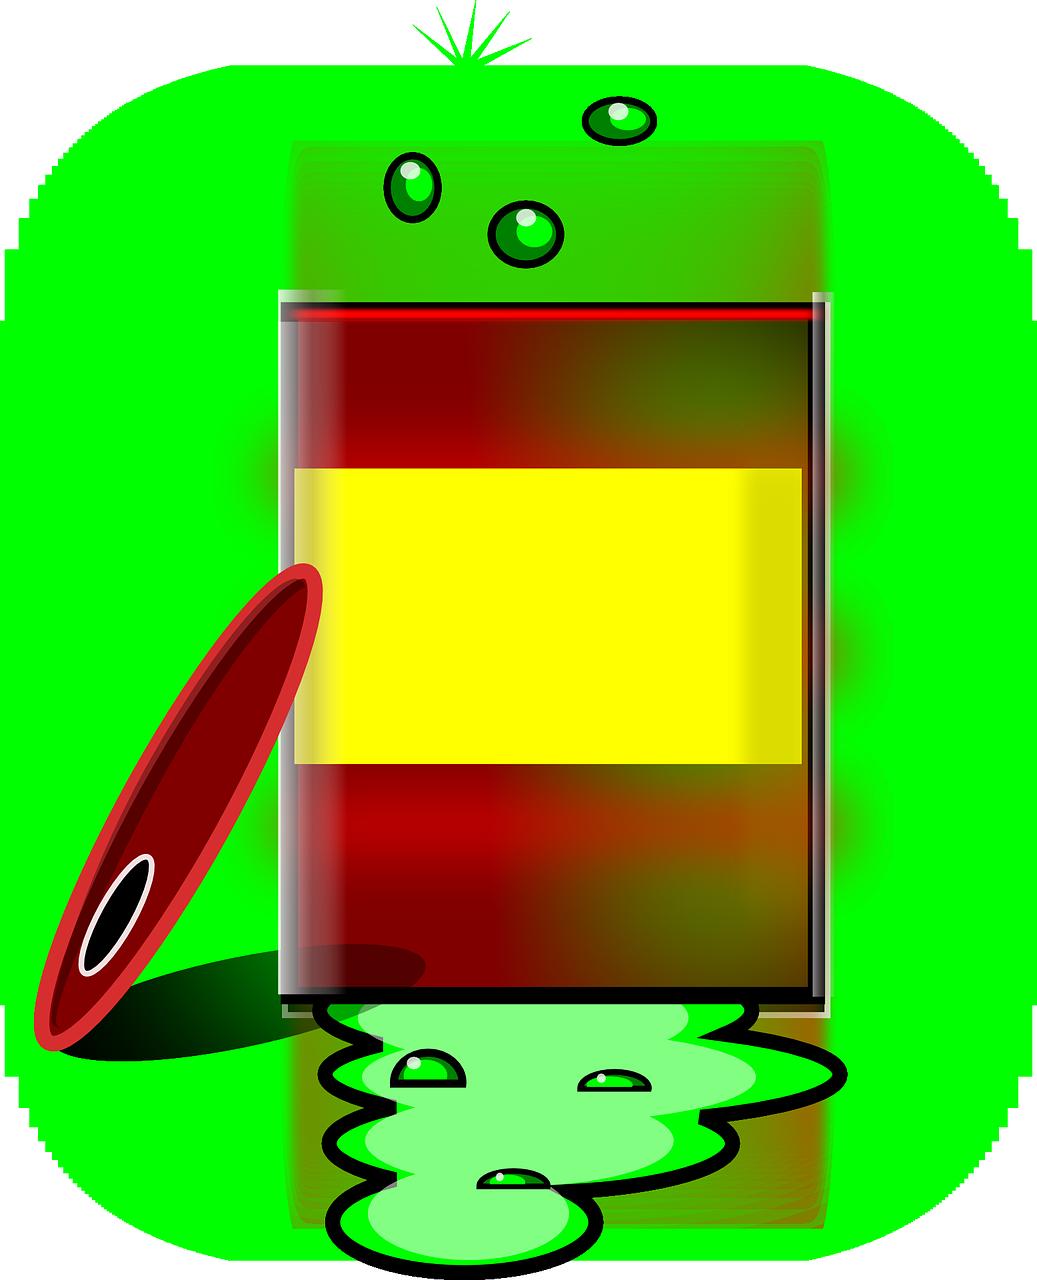 Energy clipart try hard. Detox enlightening life radioactive